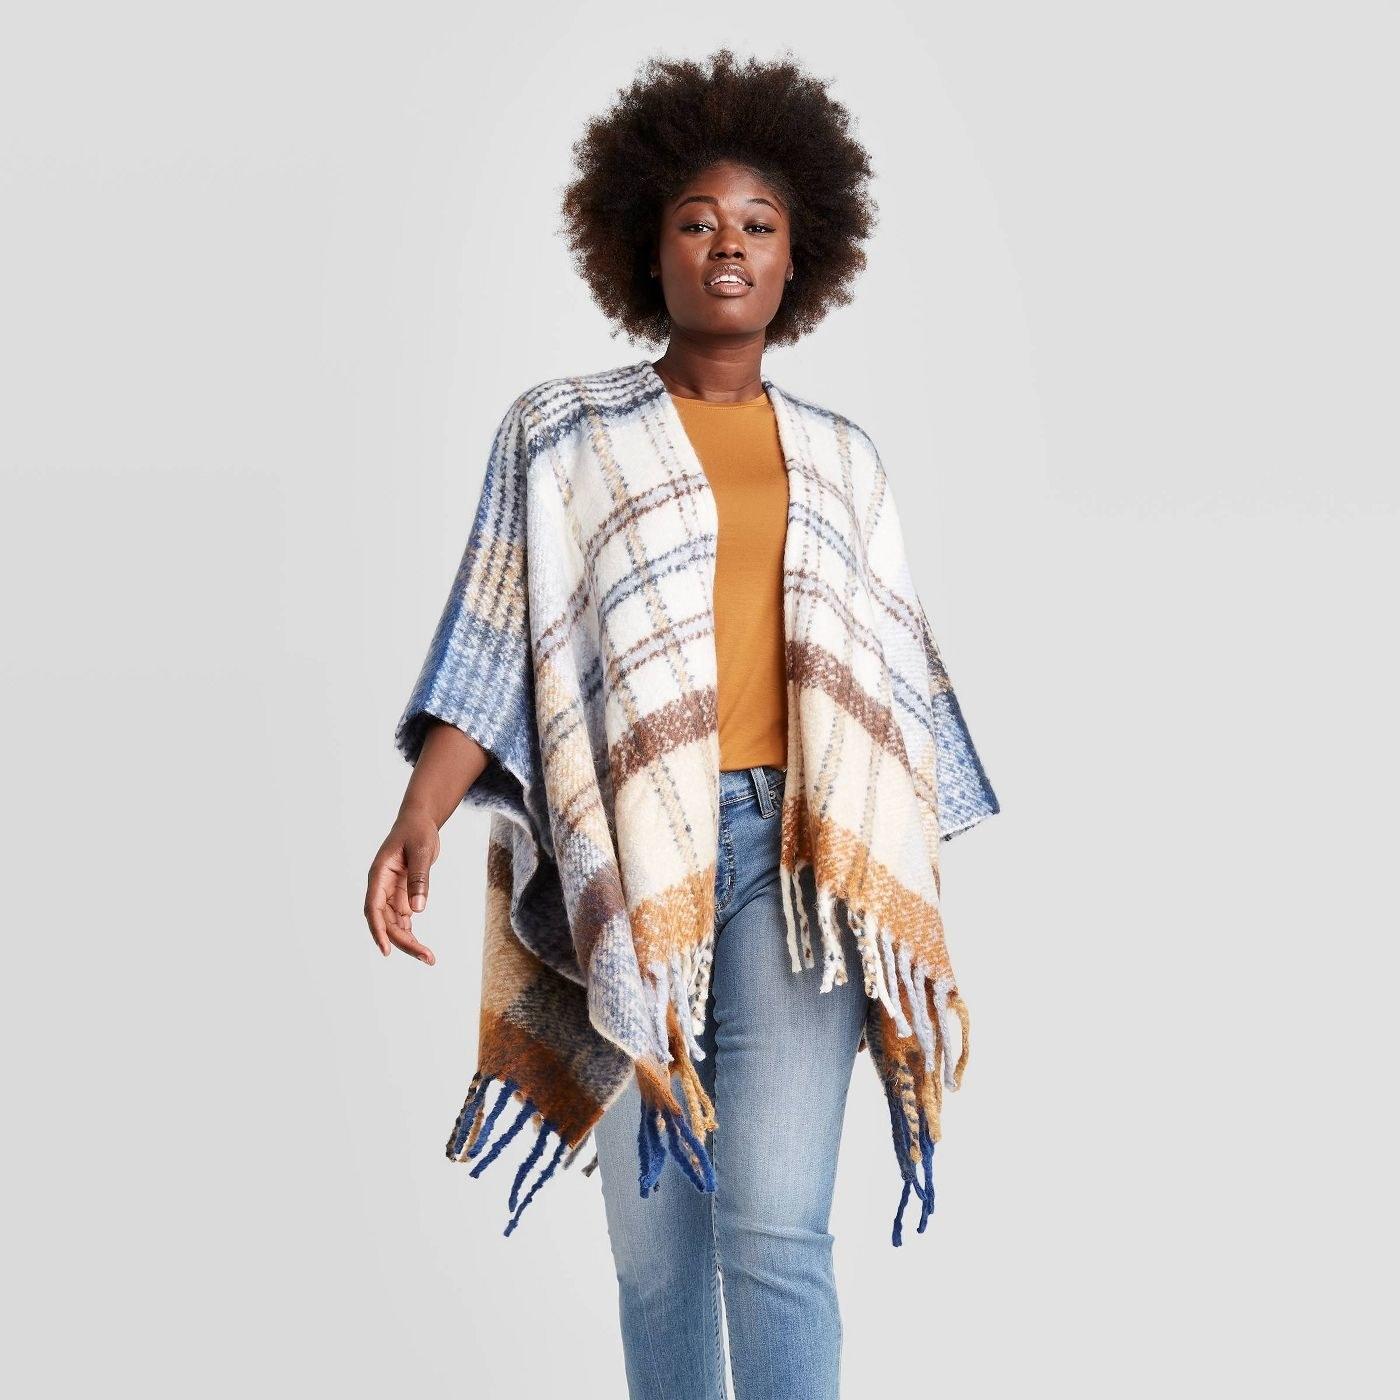 Model in plaid poncho jacket